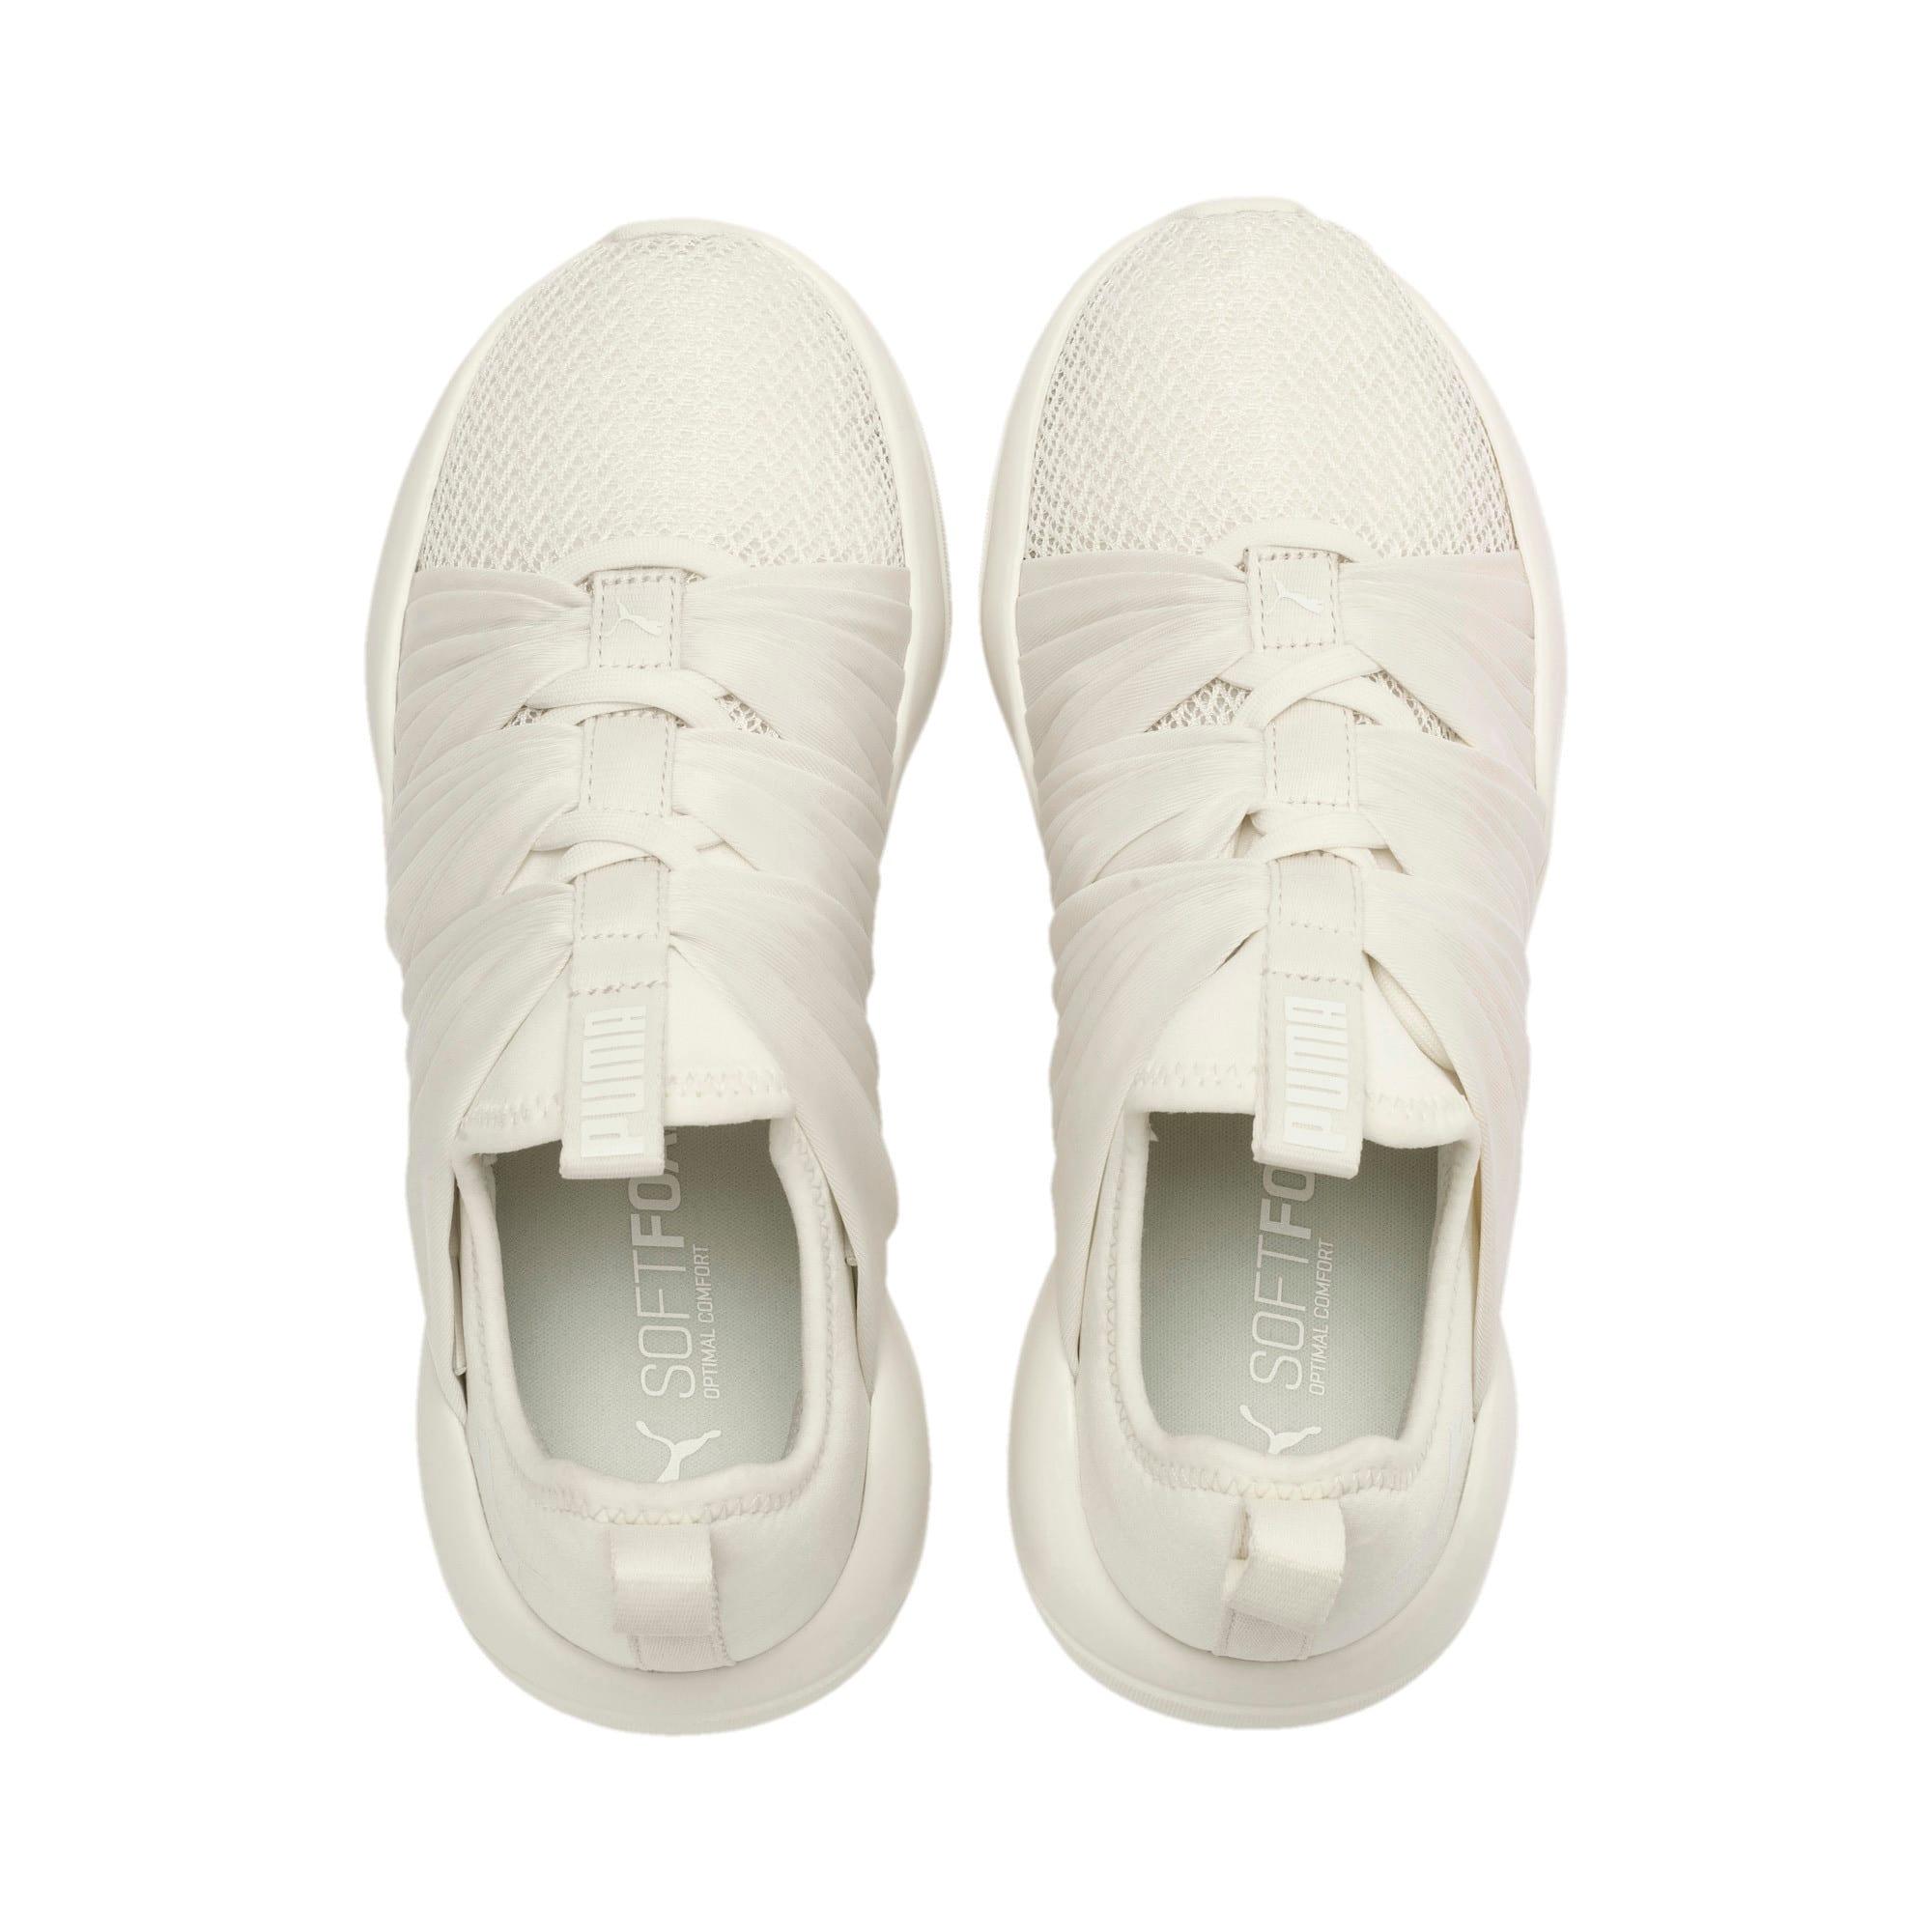 Thumbnail 6 of Flourish Women's Training Shoes, Whisper White-Puma White, medium